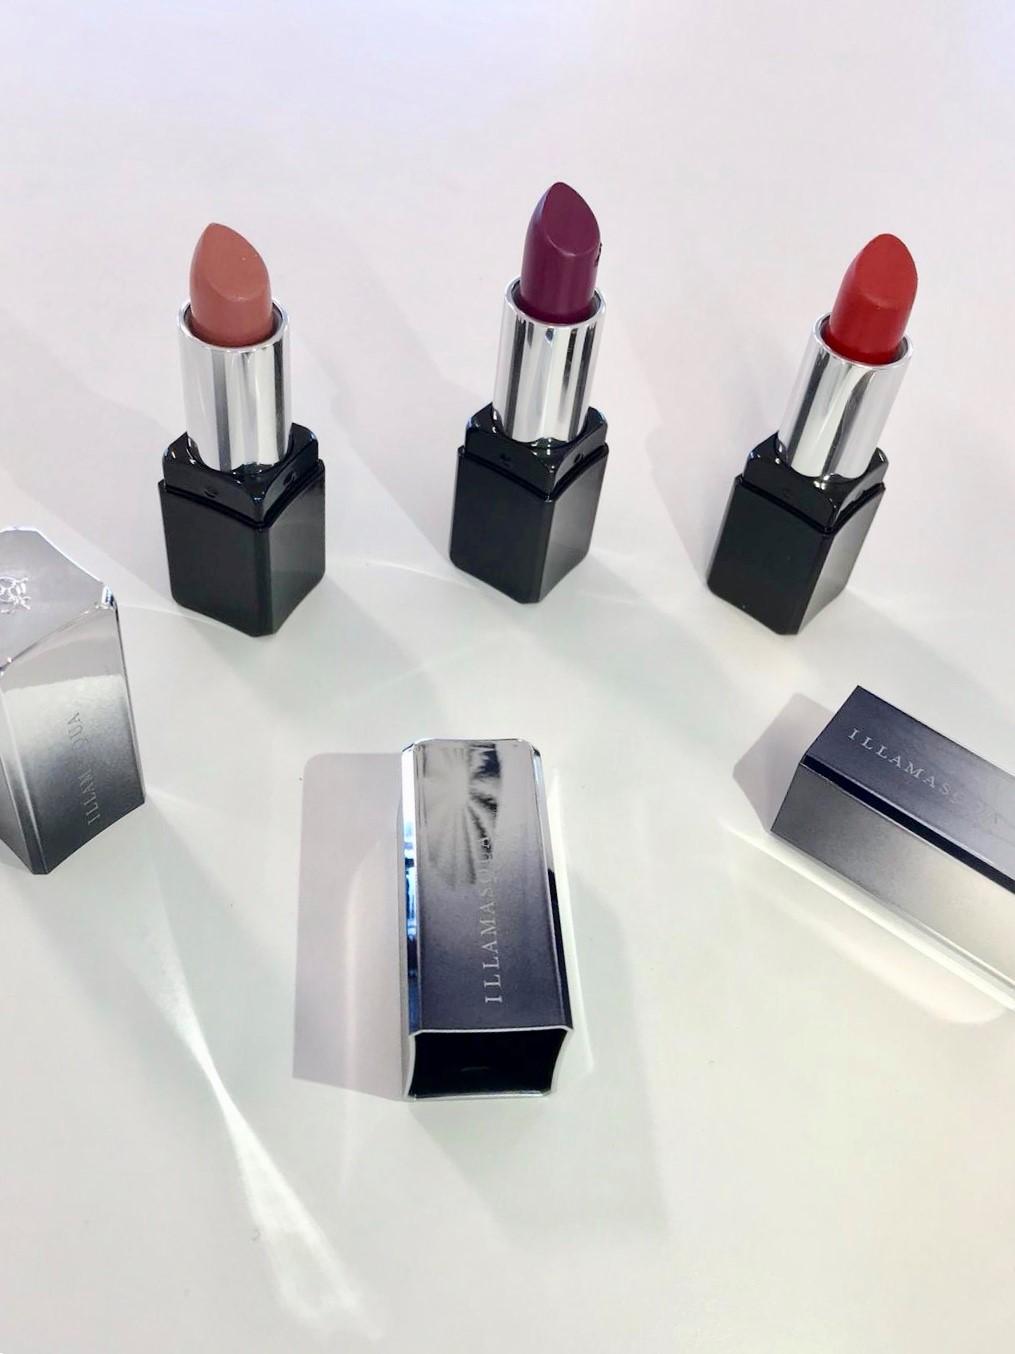 Limited-edition 10 year anniversary Antimatter Lipsticks